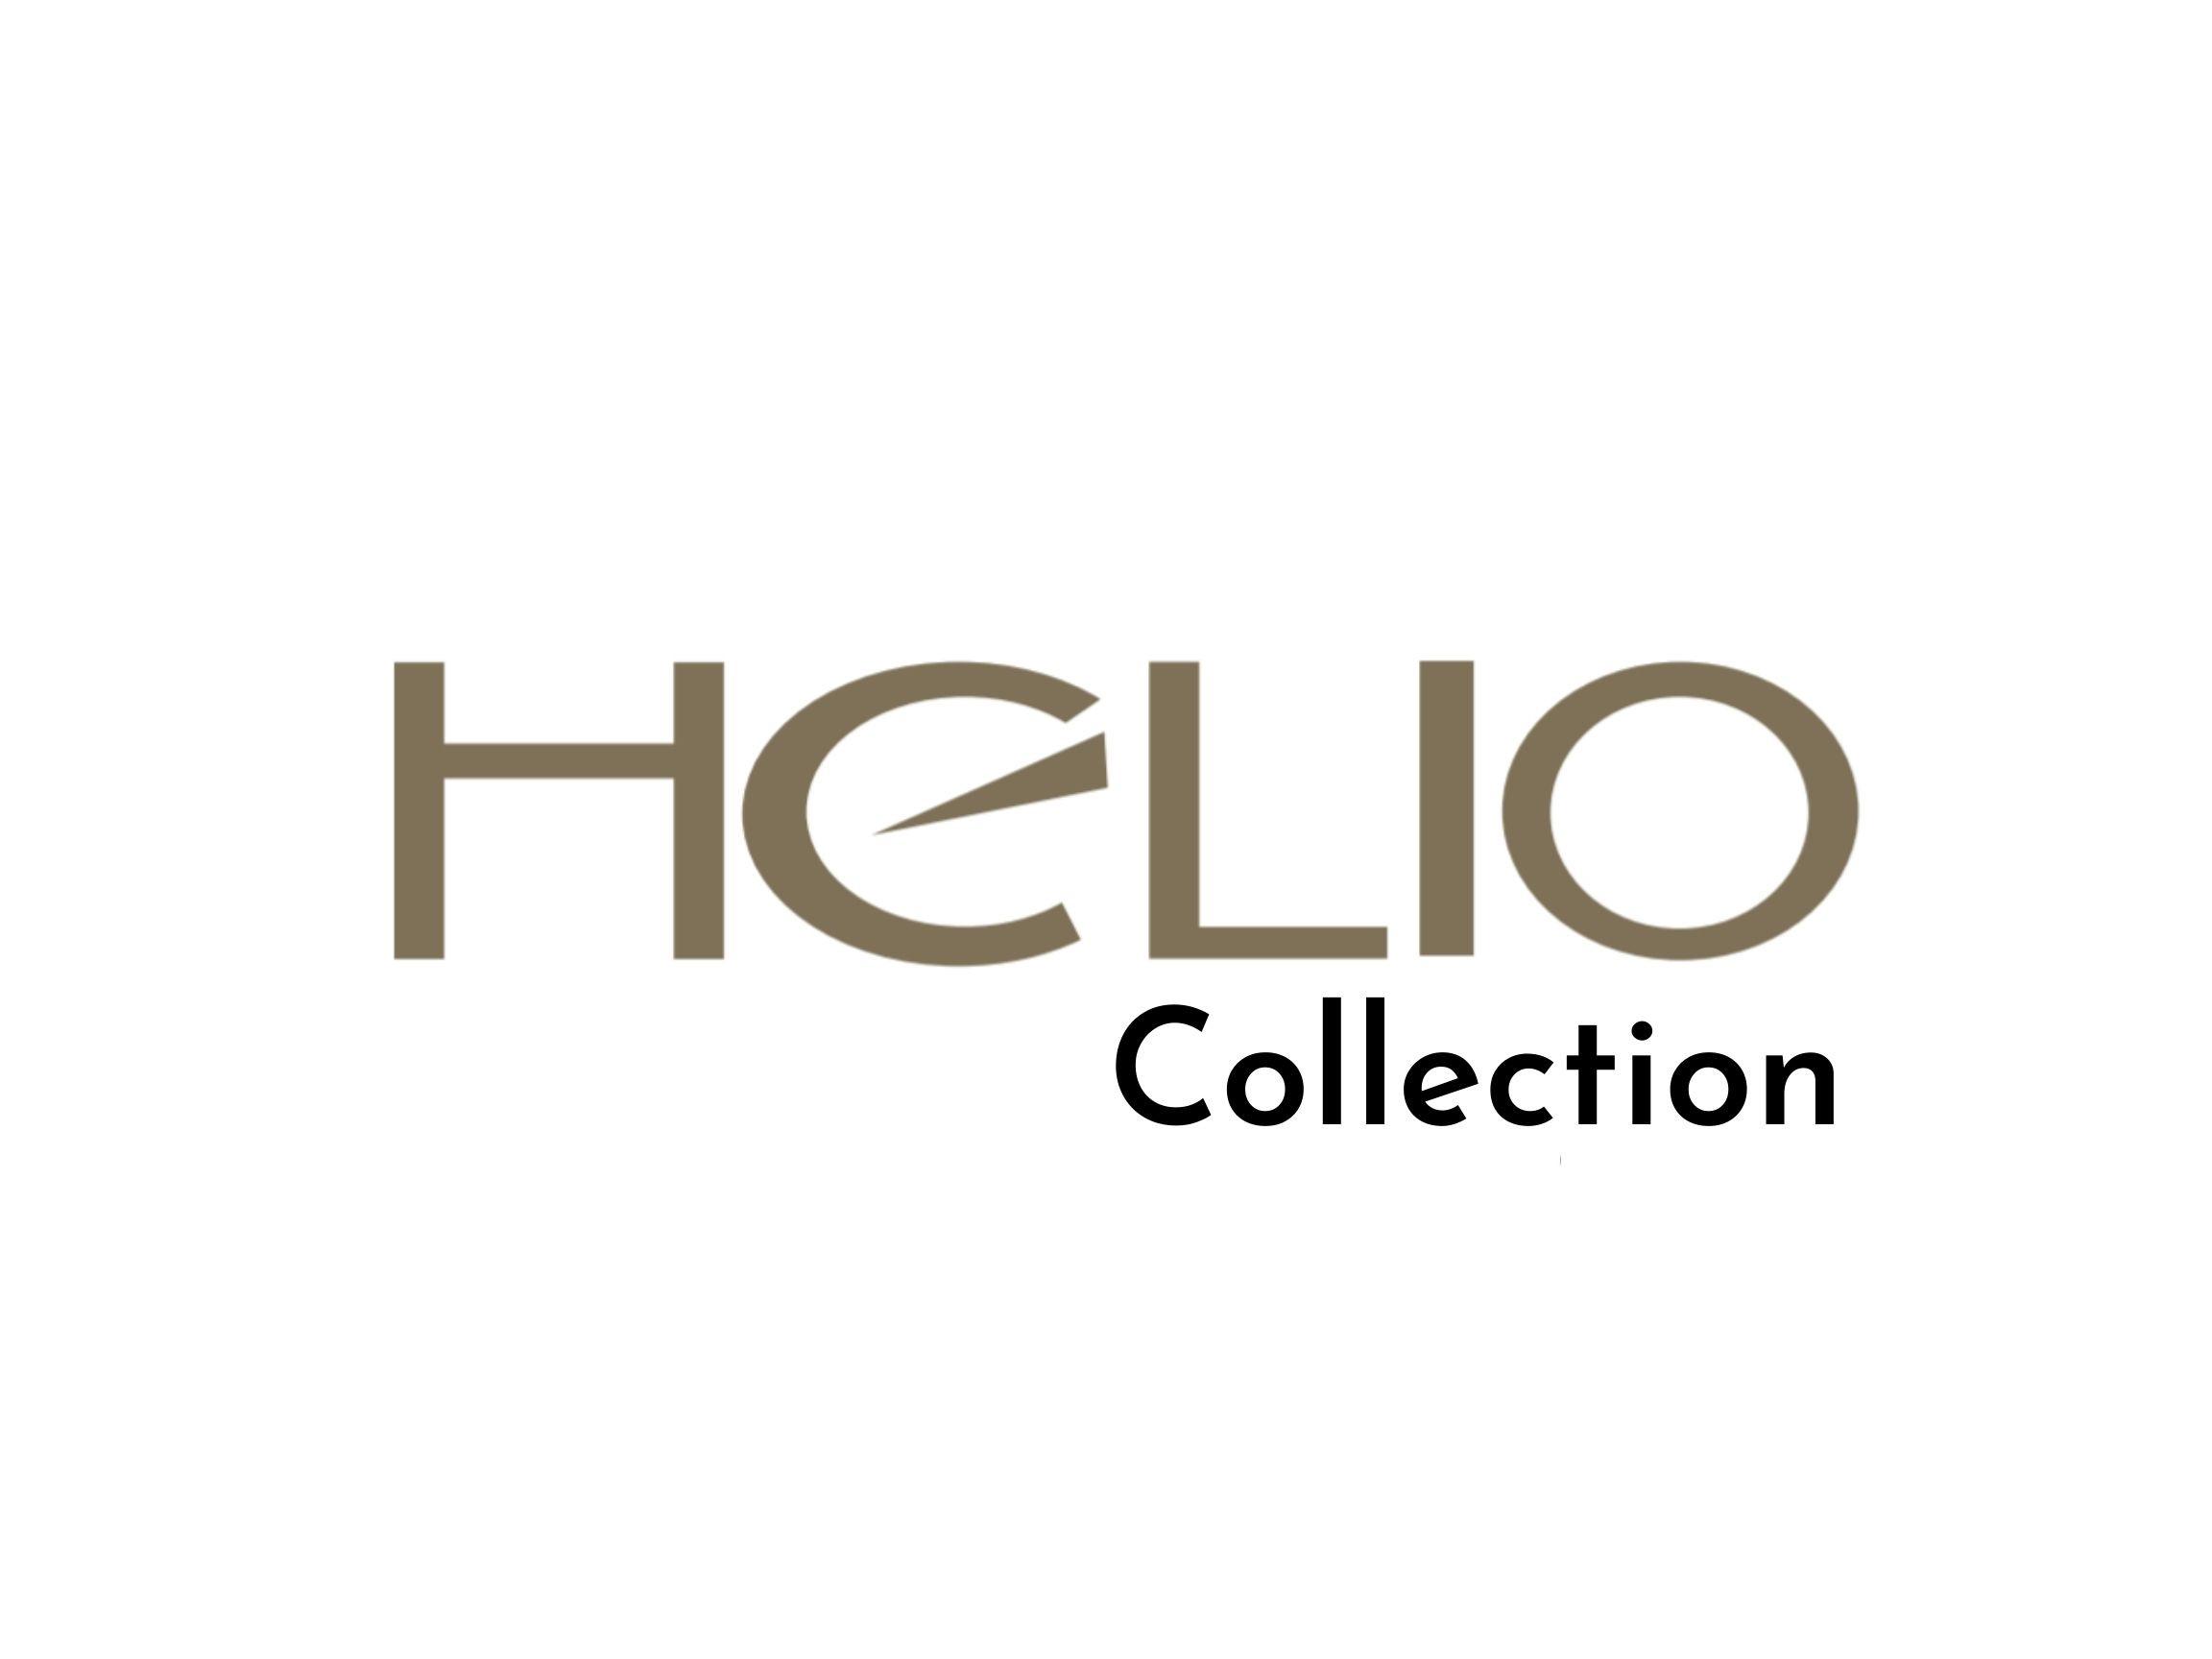 HELIO COLLECTION